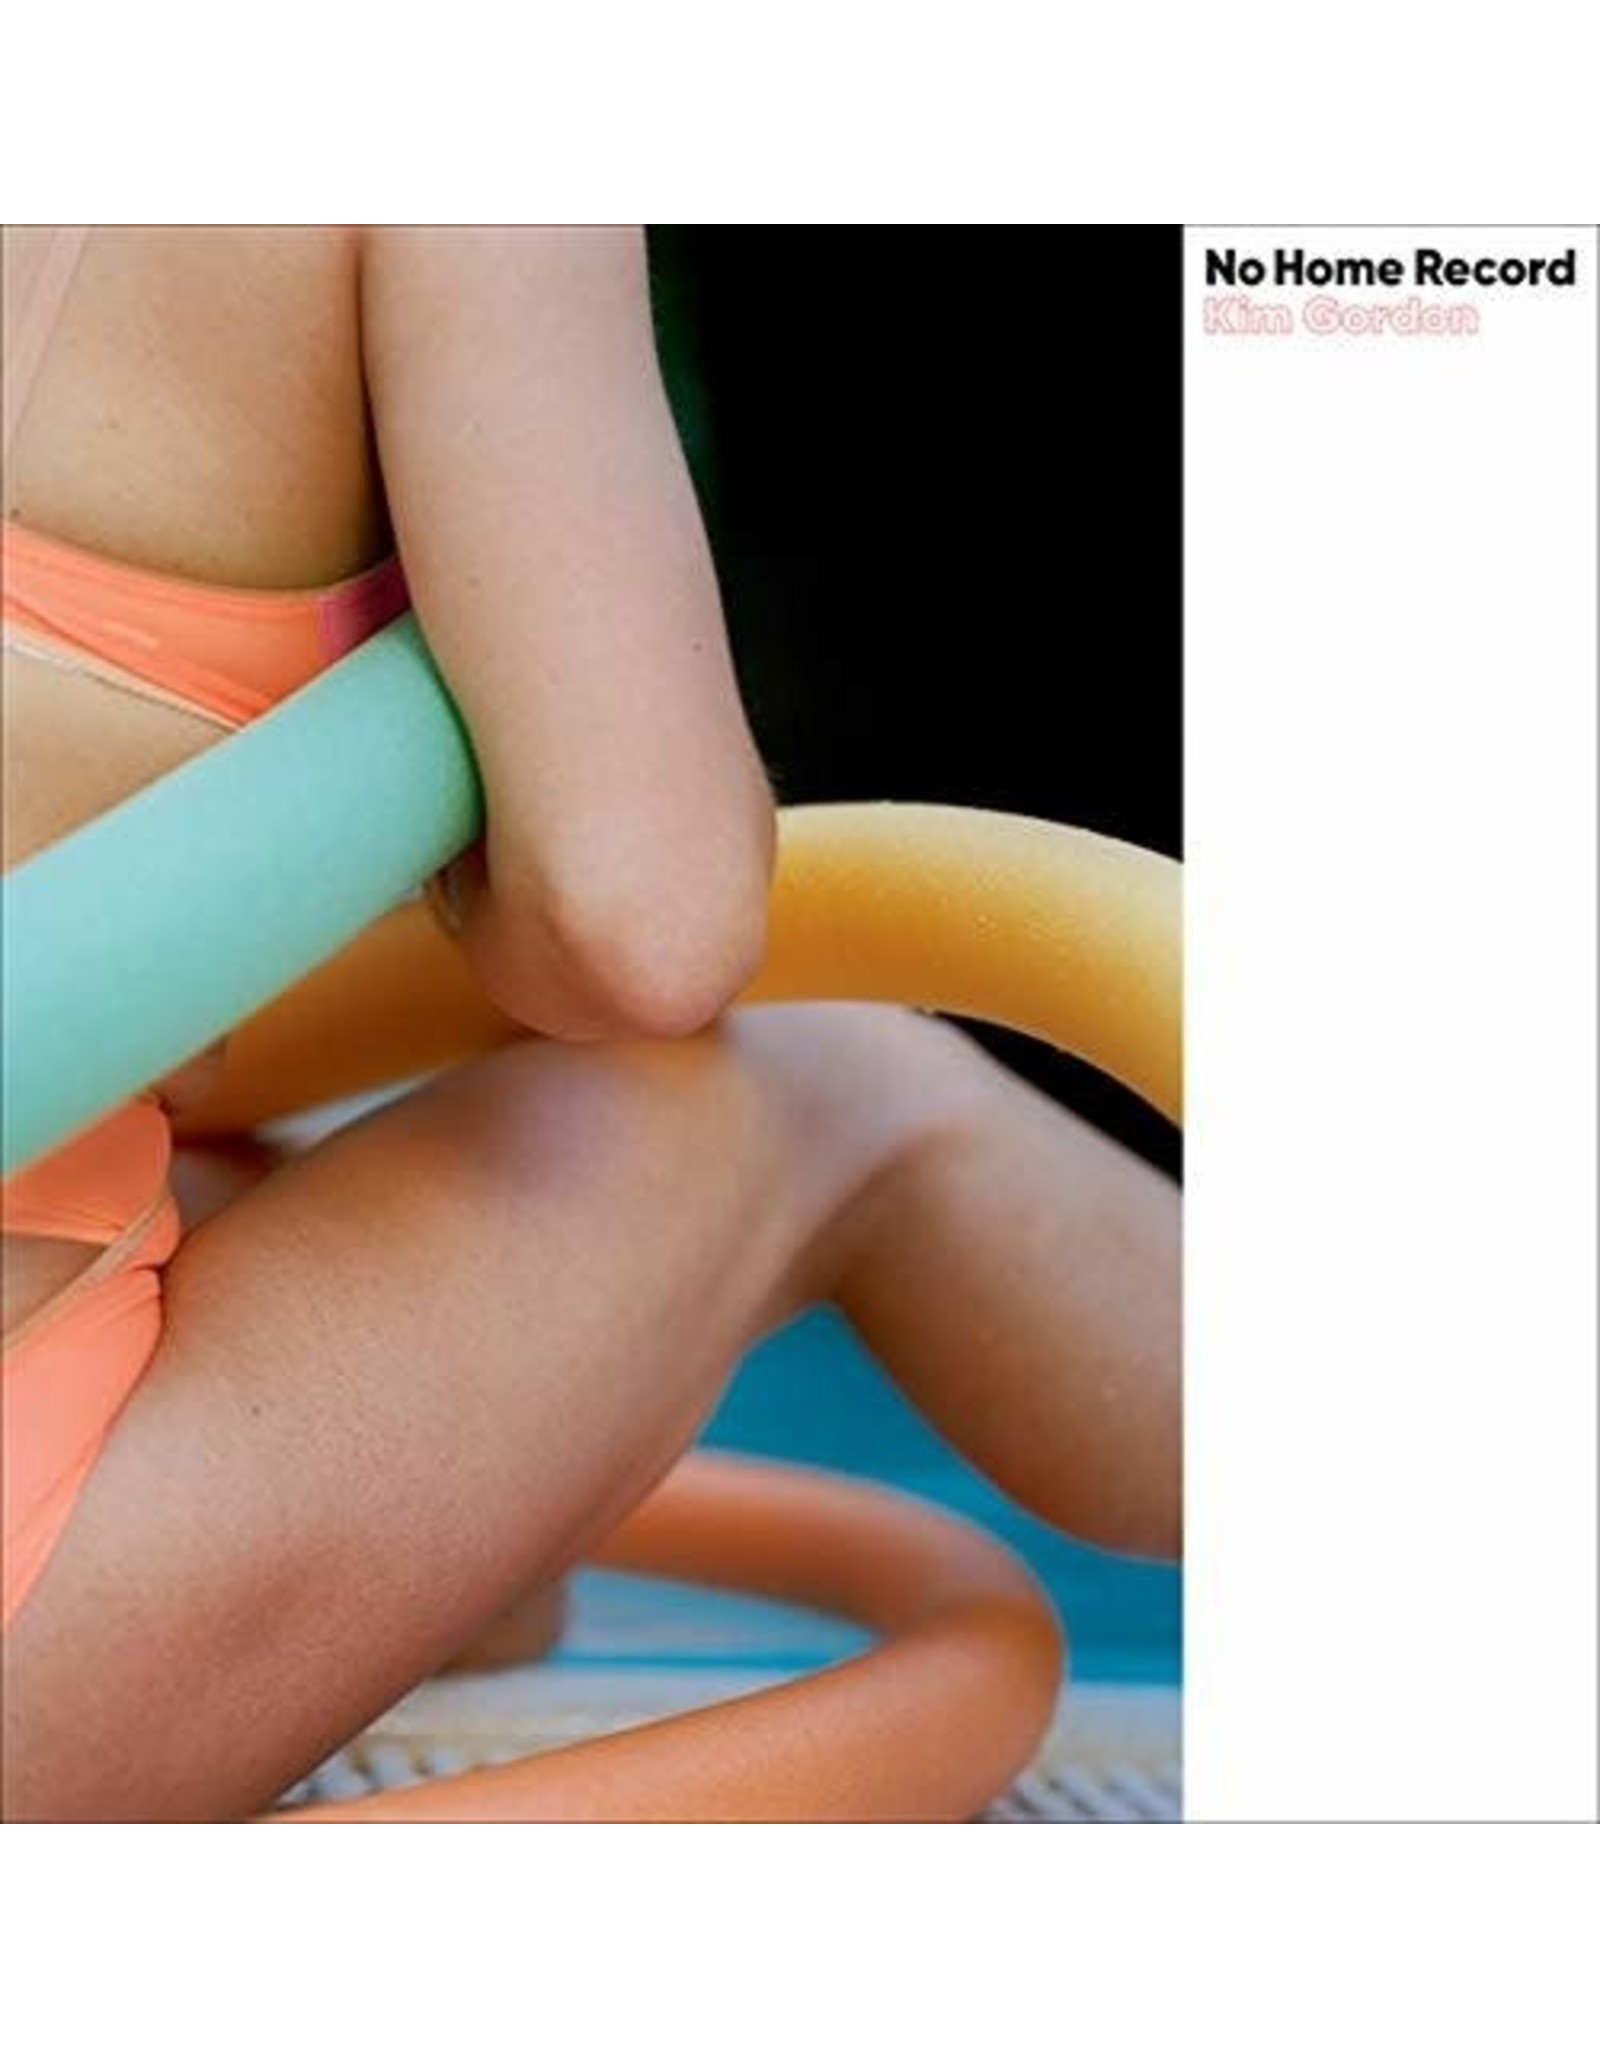 Gordon, Kim - No Home Record LP